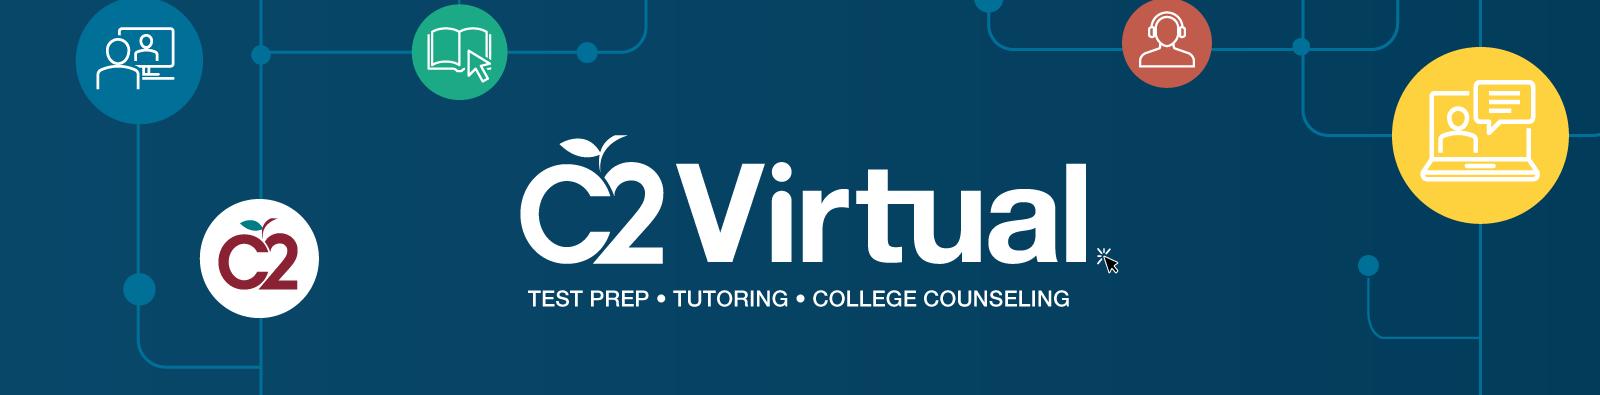 c2 virtual logo